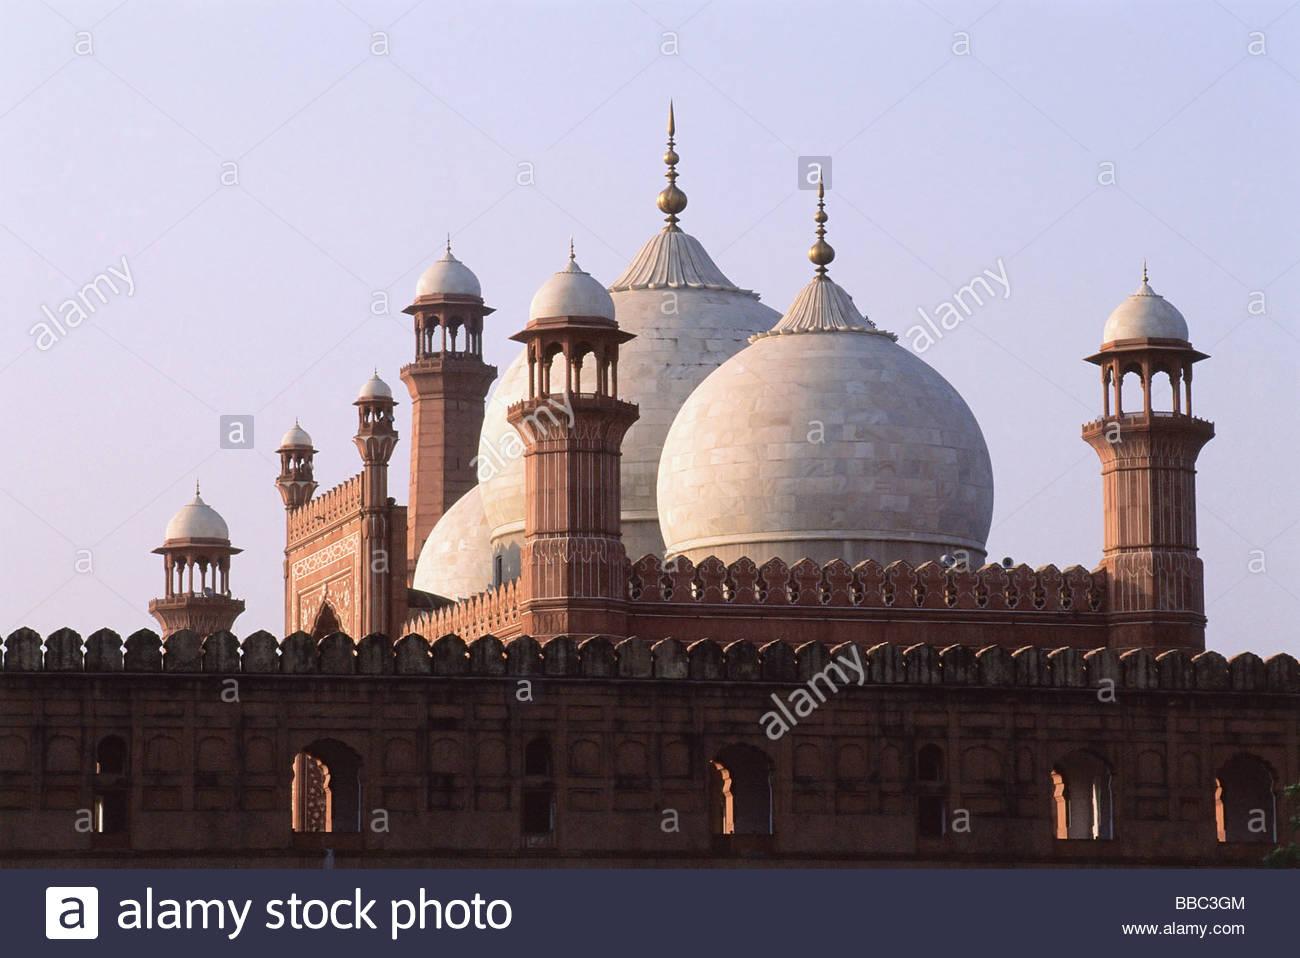 Dome Shaped Roofs Amp Pakistan Punjab Lahore Dome Shape Roof